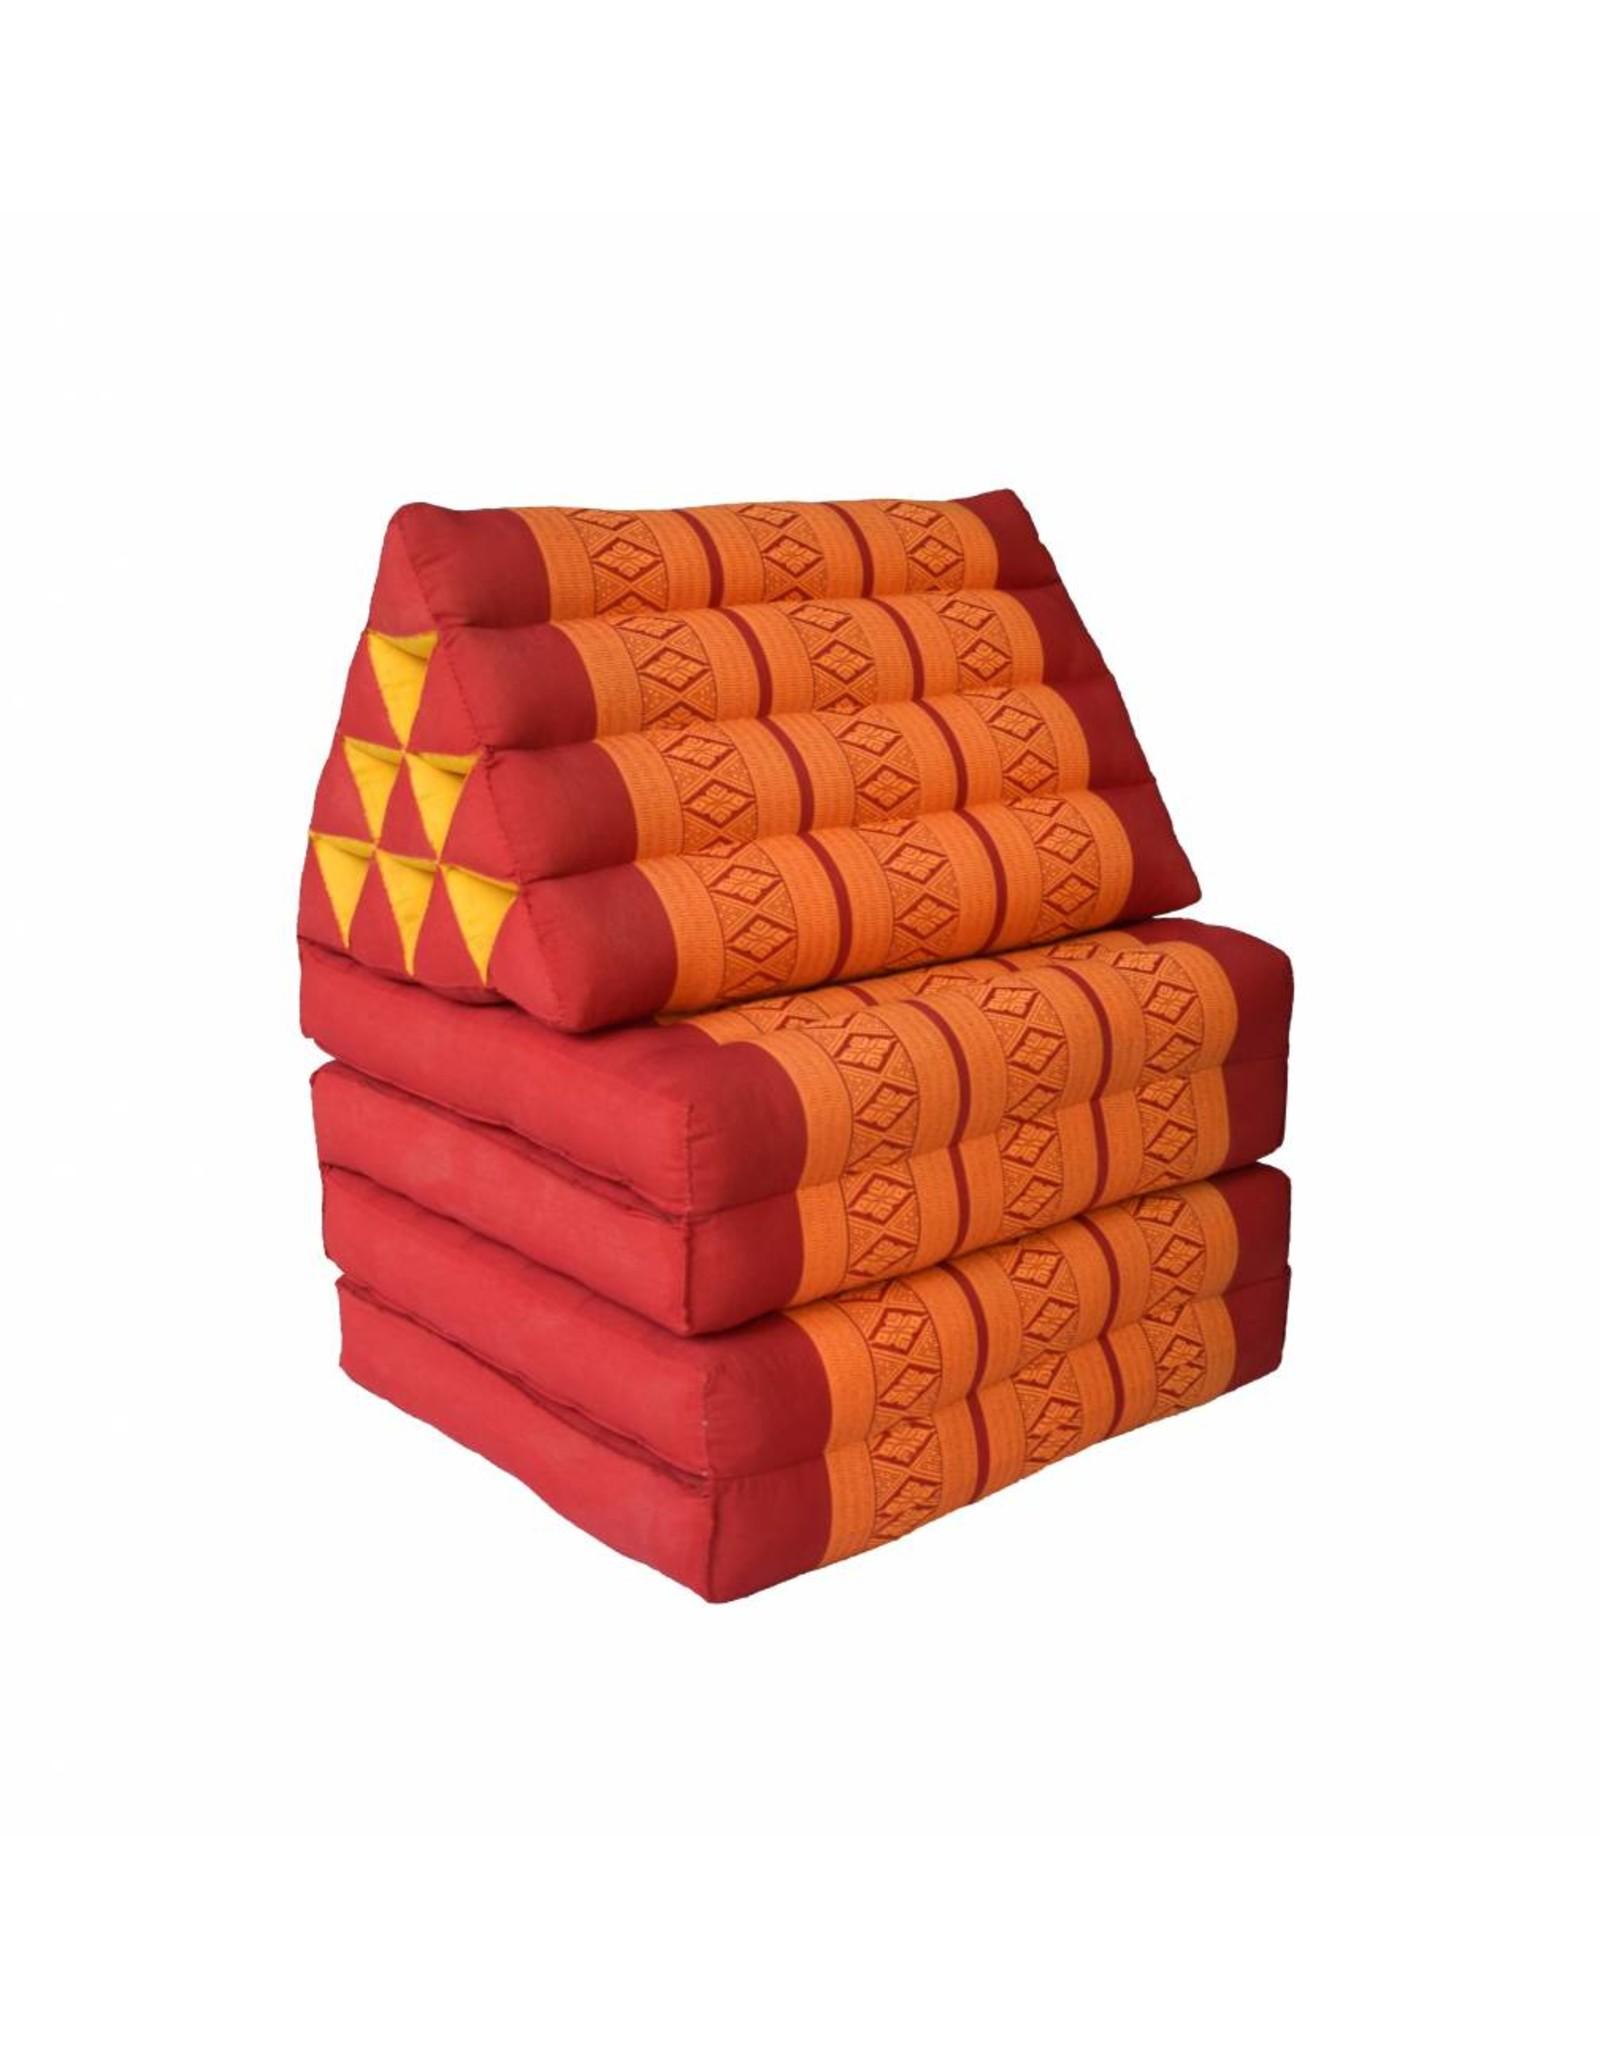 Thai Moonz Thai Floor Cushion Triangle Pillow Original 4 Mat Red/Orange